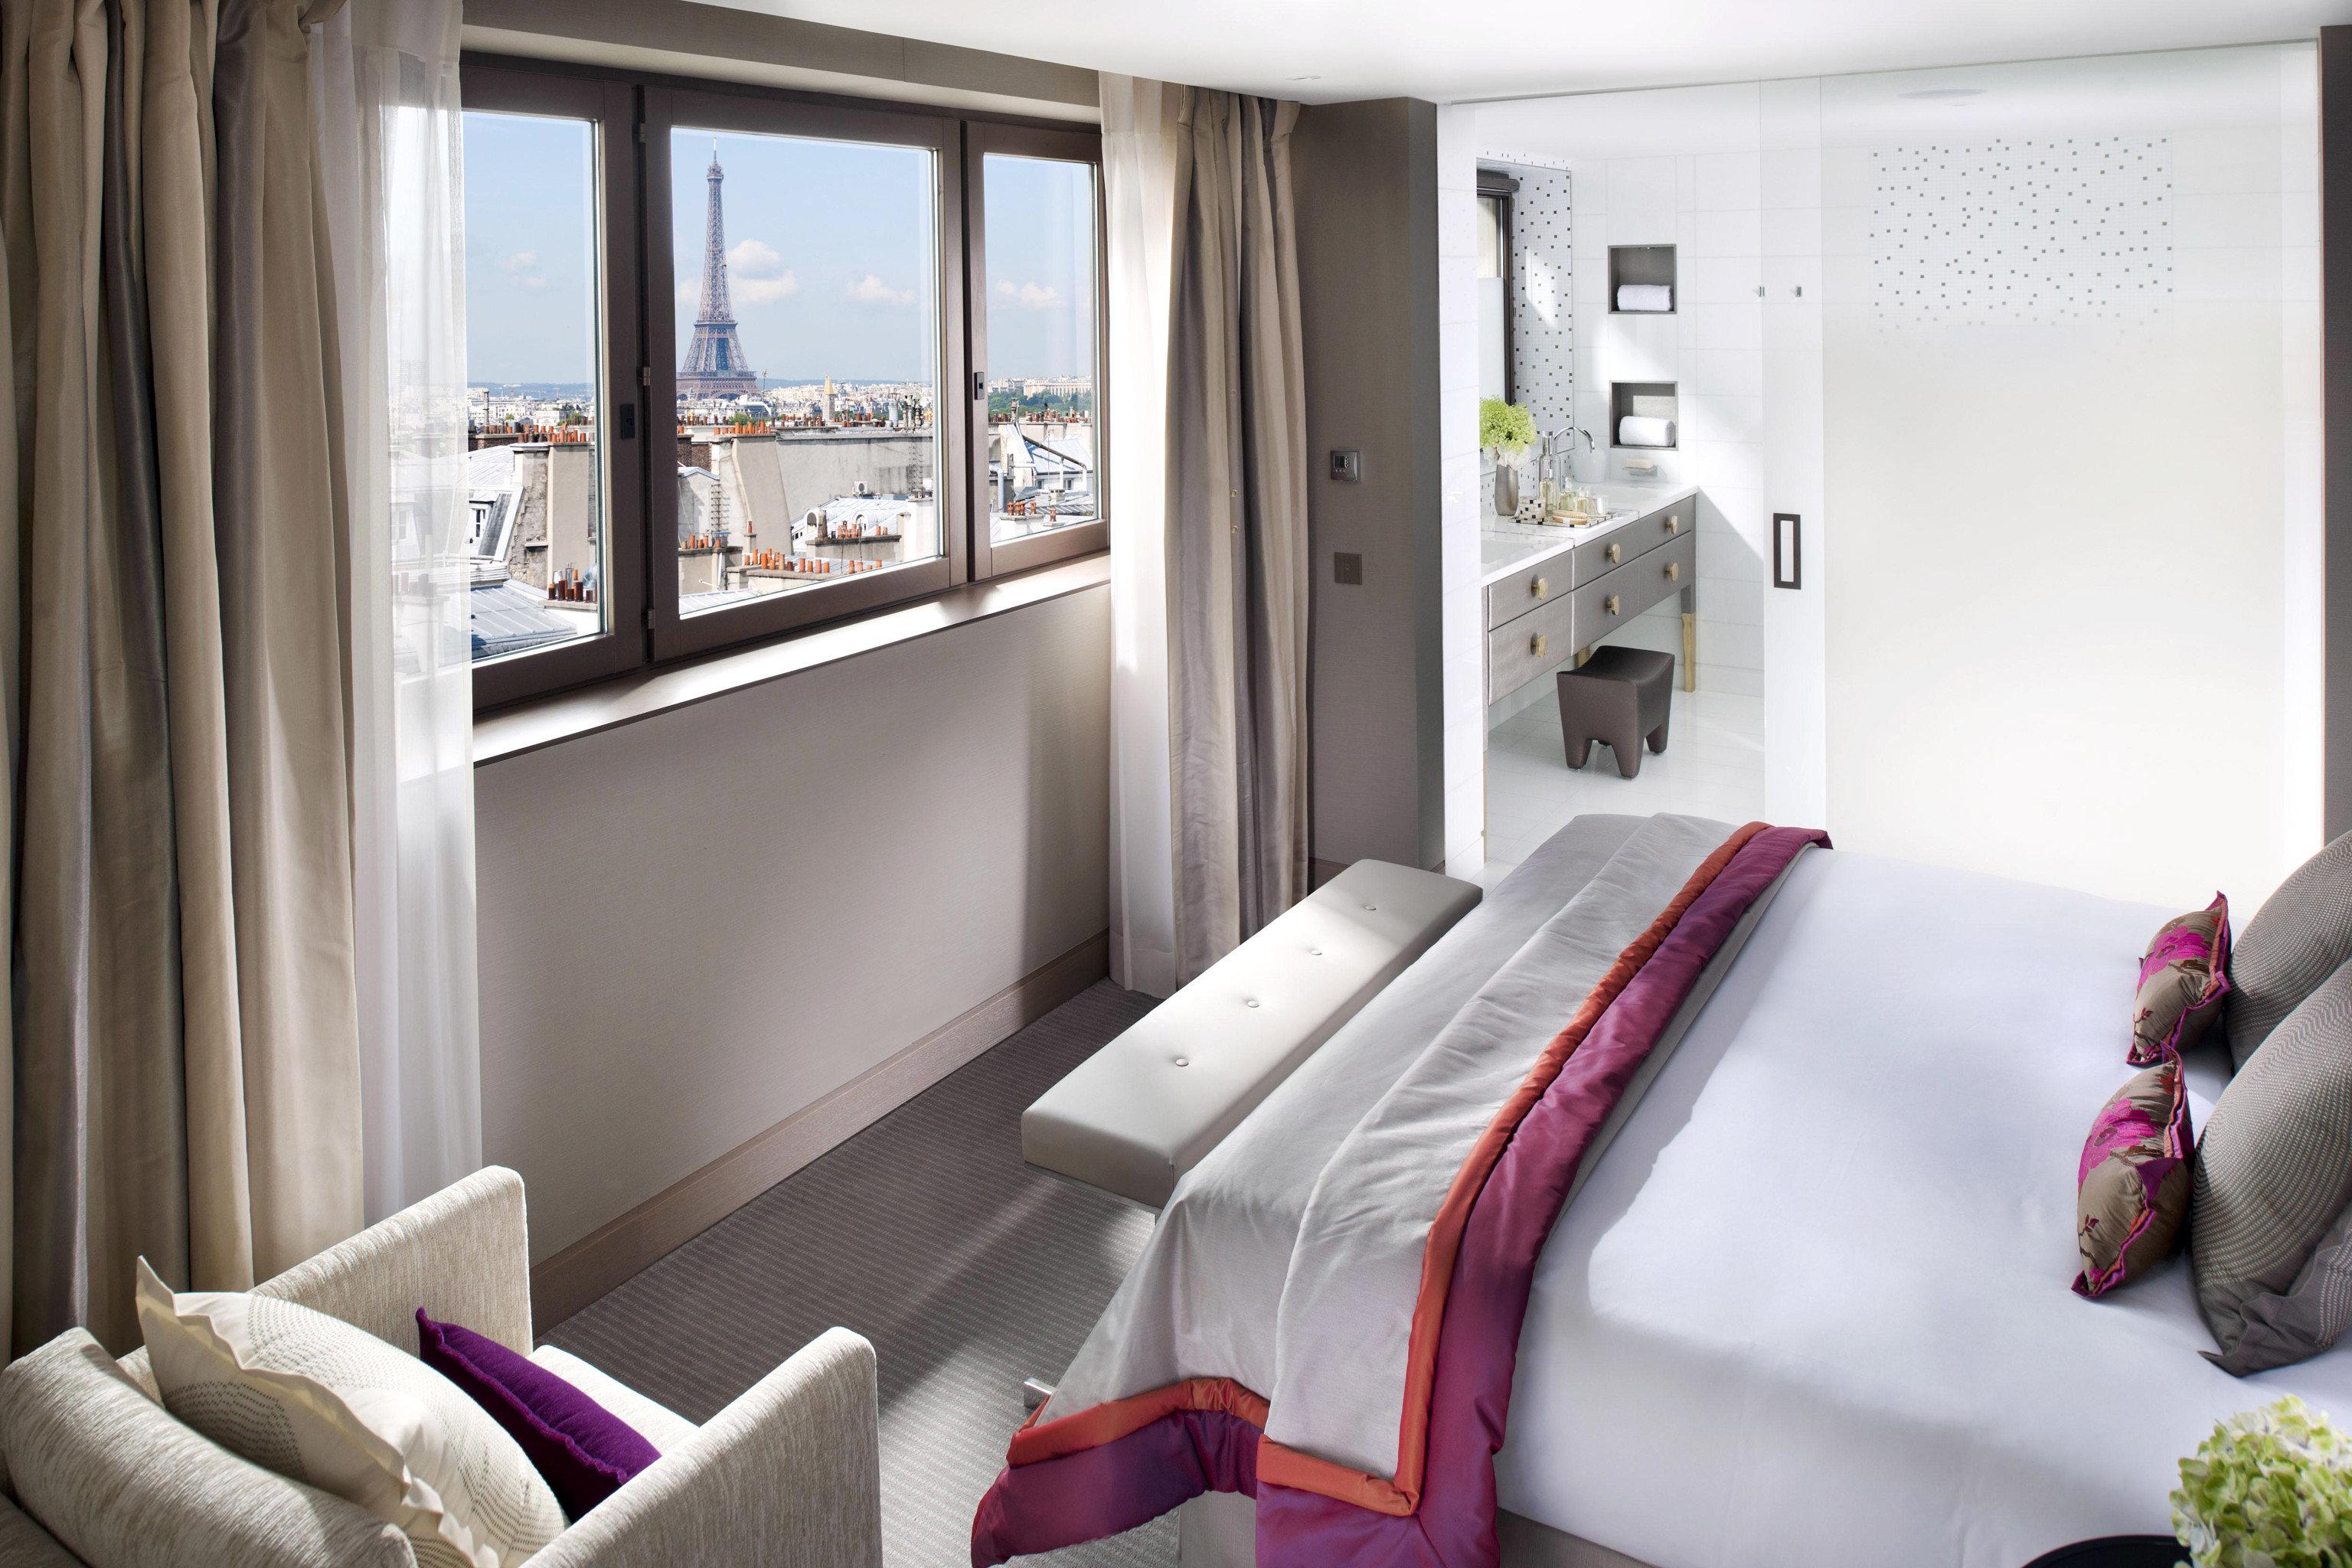 Bath Bedroom City Elegant Landmarks Luxury Modern Scenic views Suite sofa property home house living room cottage condominium